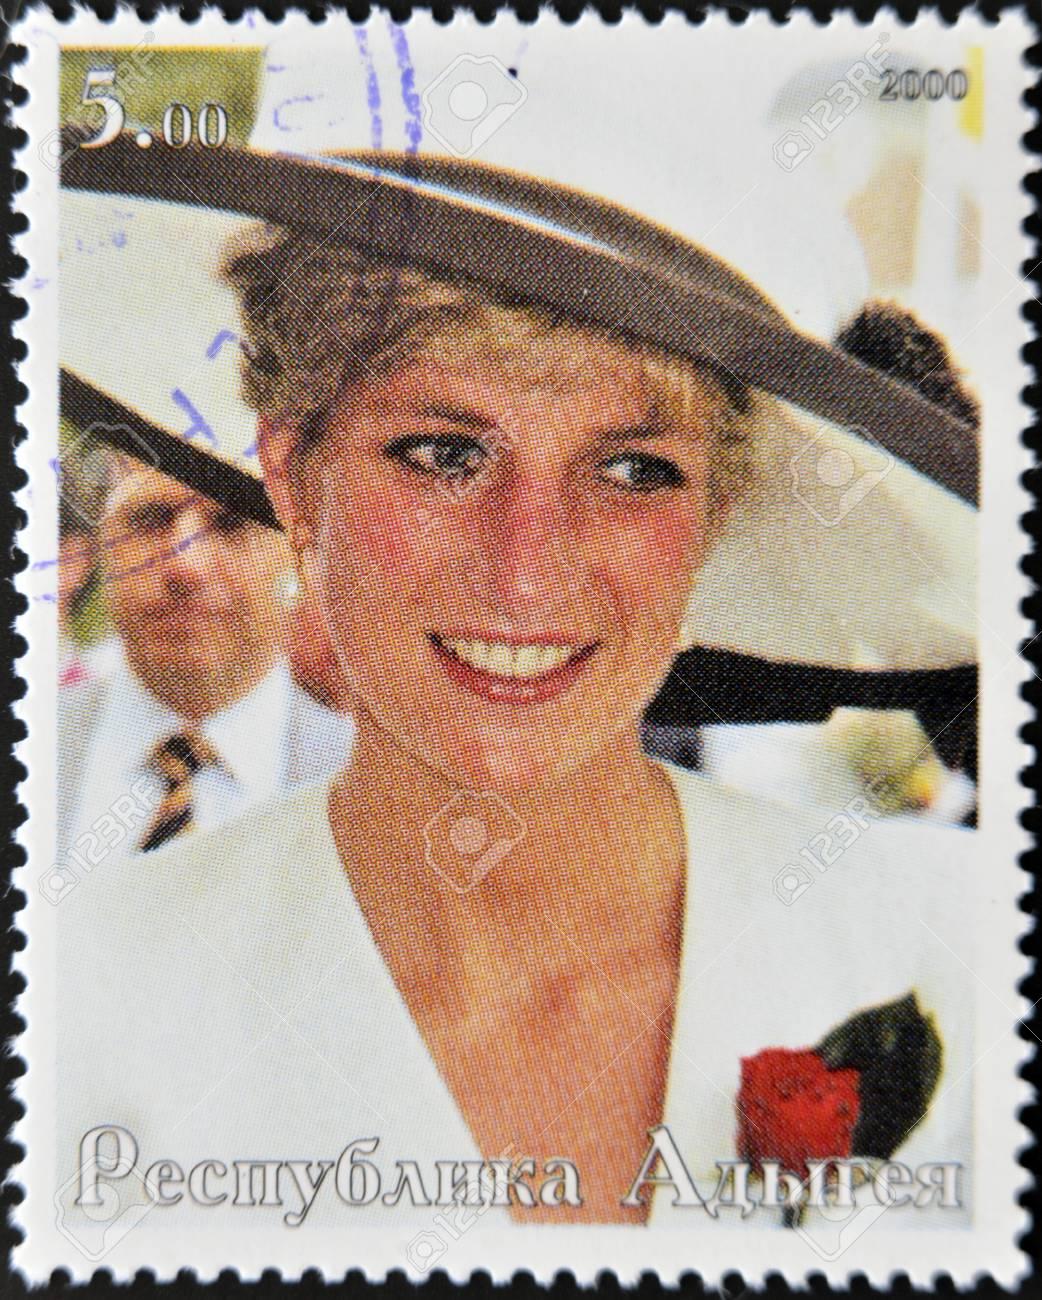 ABKHAZIA - CIRCA 2000   Stamp printed in Abkhazia shows portrait  Princess Diana of Wales, circa 2000 Stock Photo - 14277656